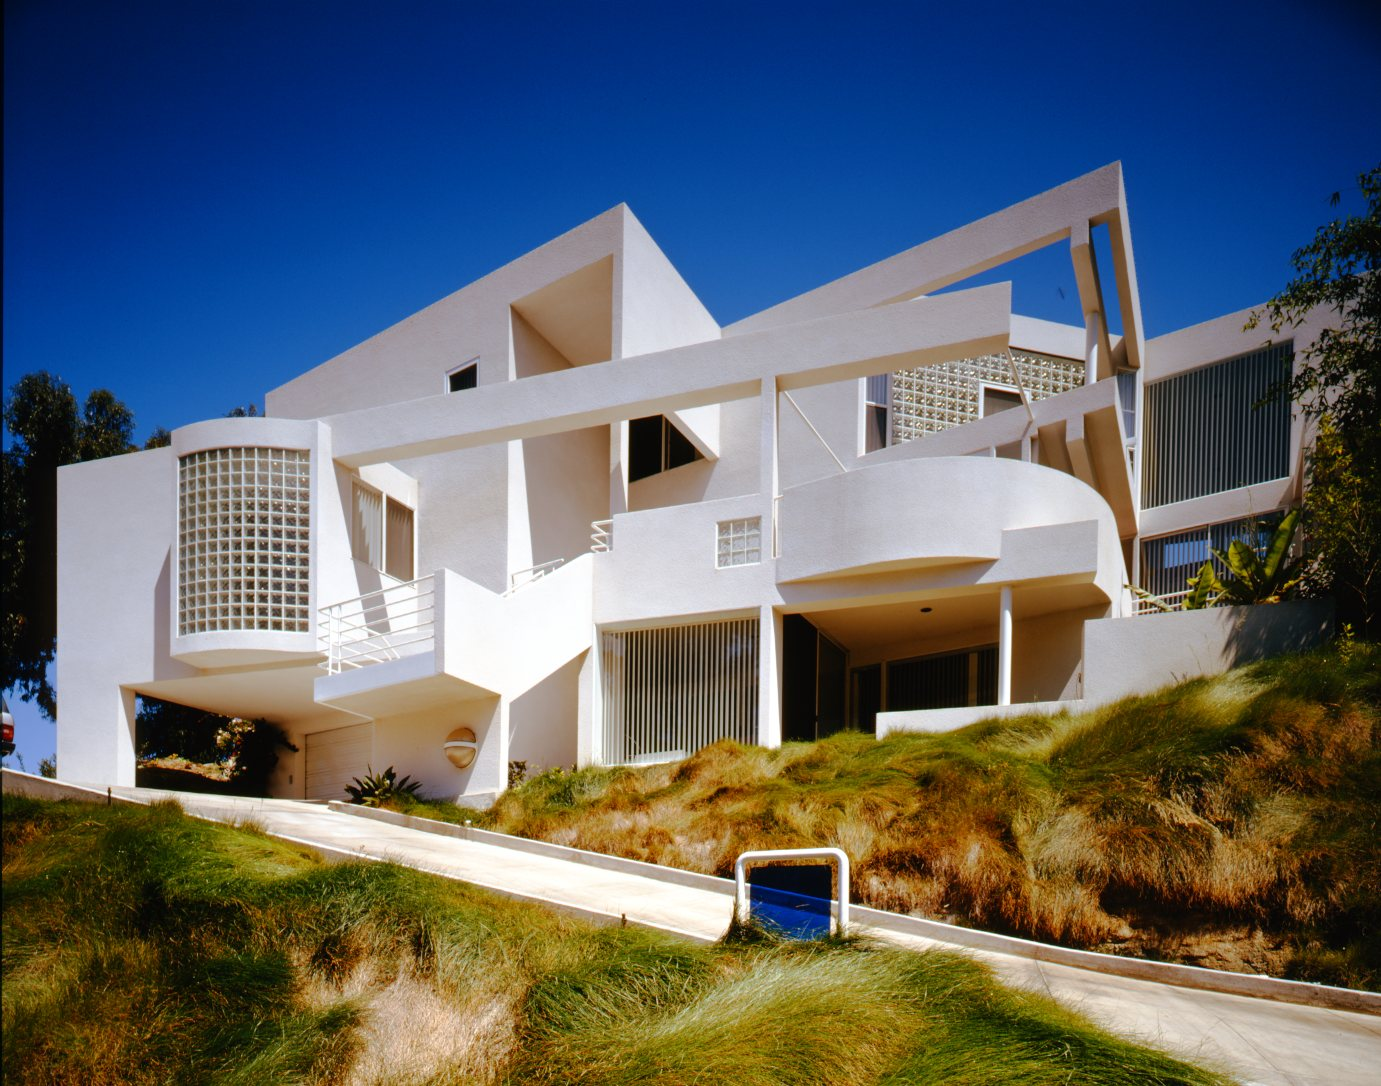 Balboa House